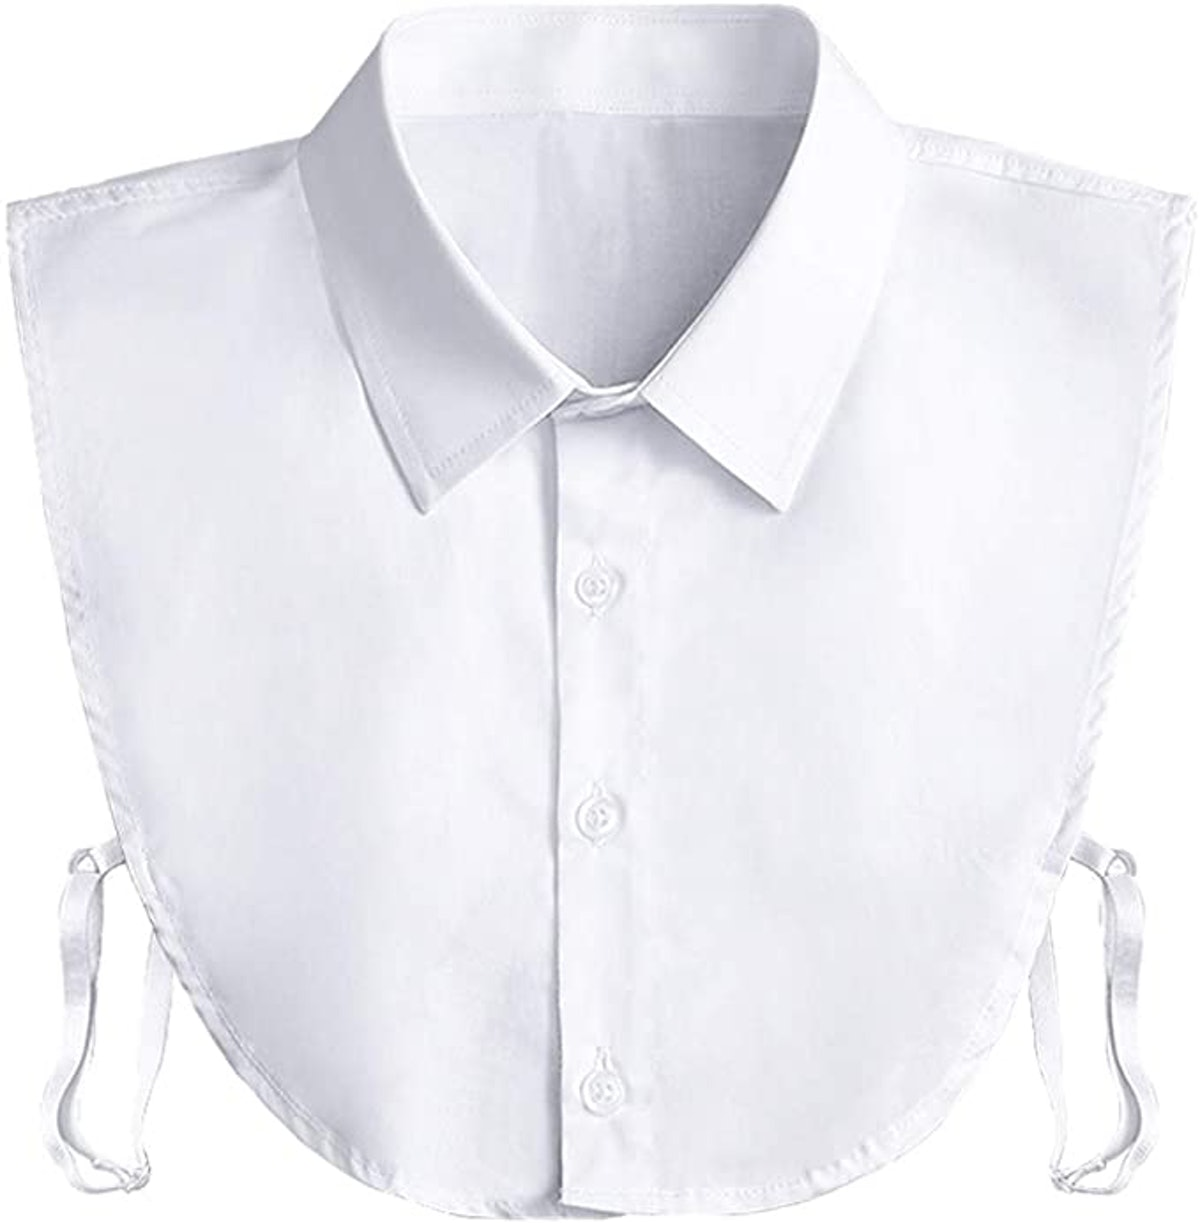 Kalkehay Detachable Dickey Collar